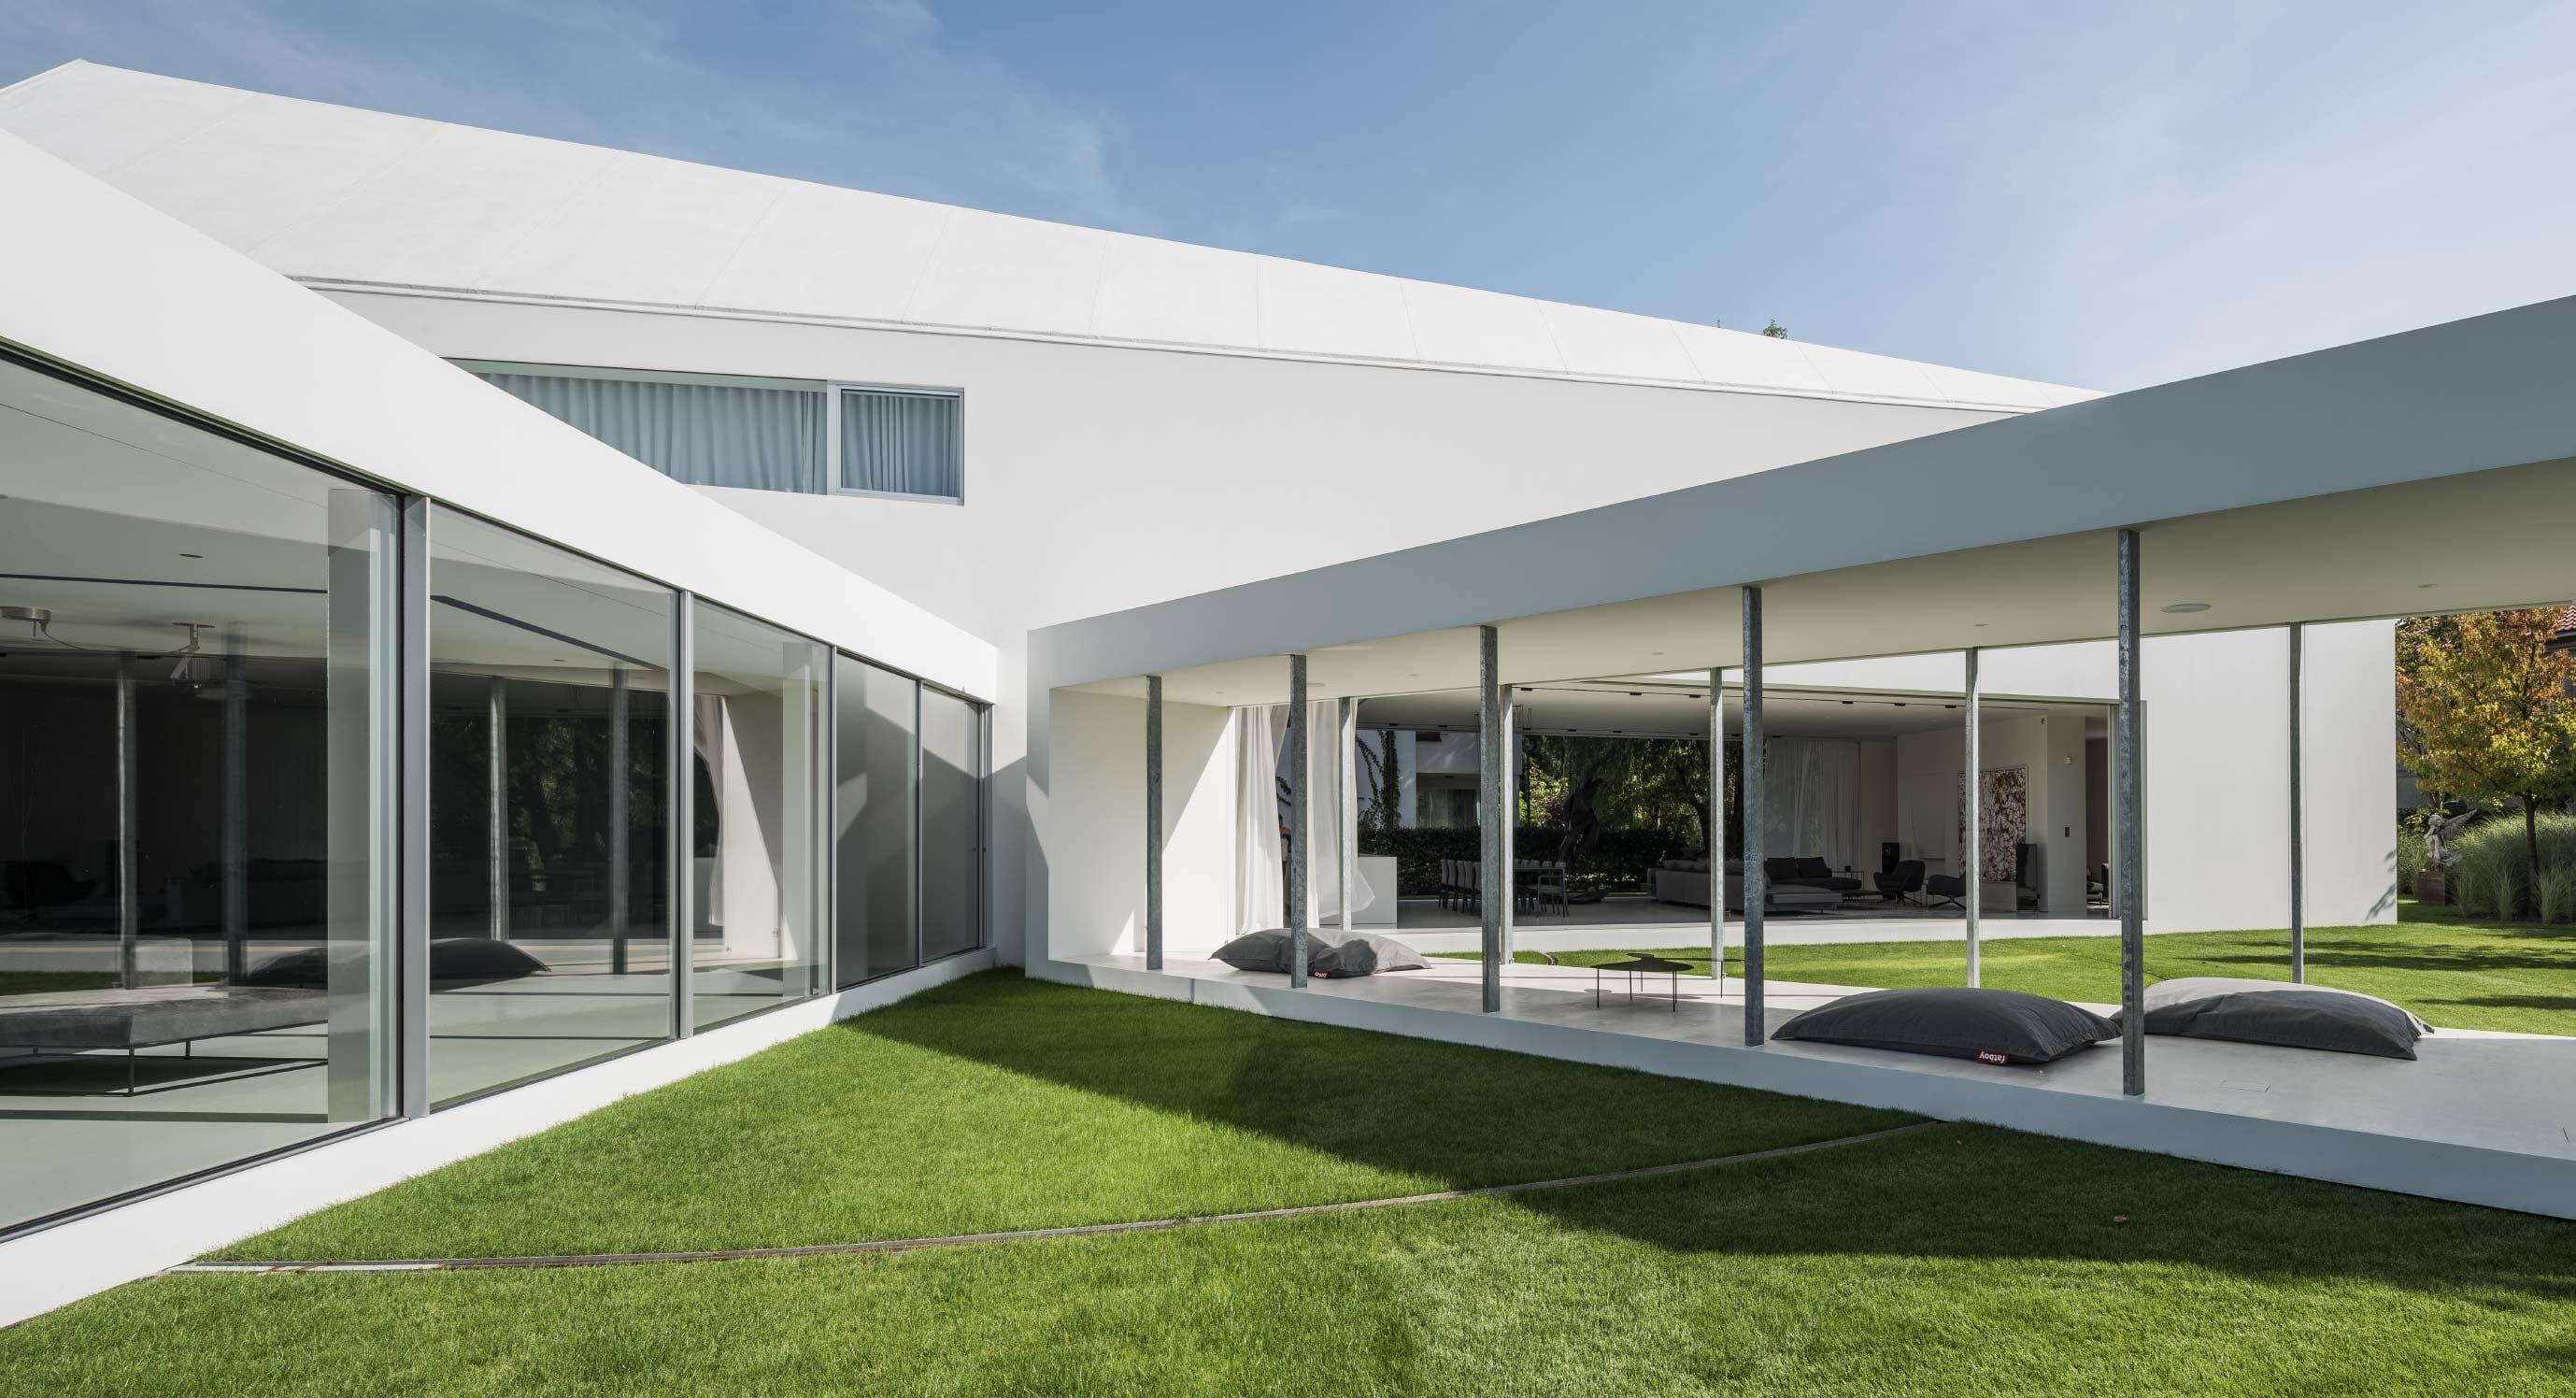 KWK Promes' Quadrant House Reacts To The Sun's Movement